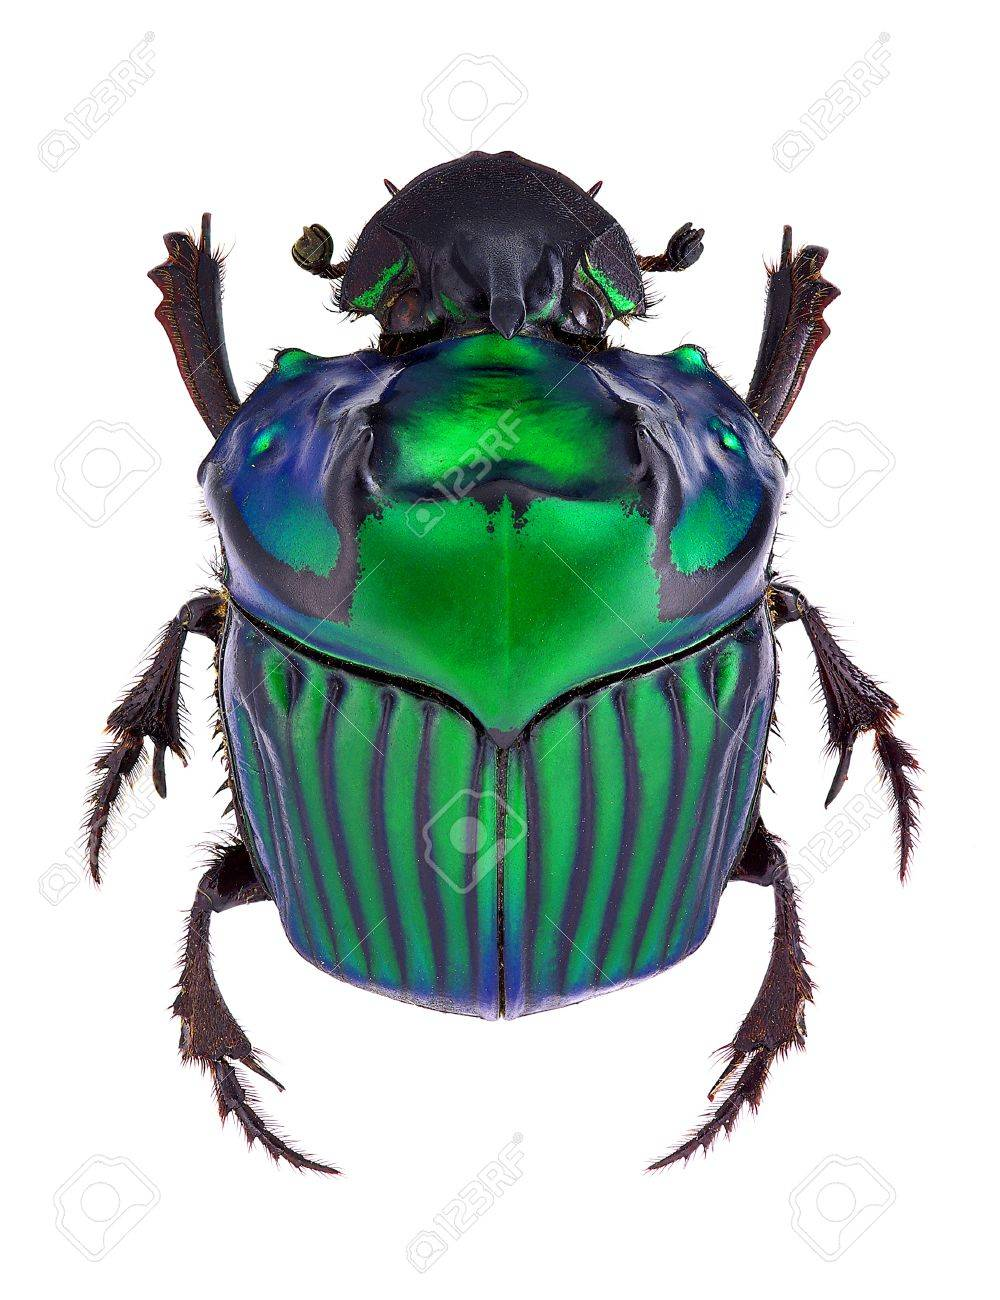 Oxysternon conspicillatum, dung beetle from South America, male specimen Standard-Bild - 17689155